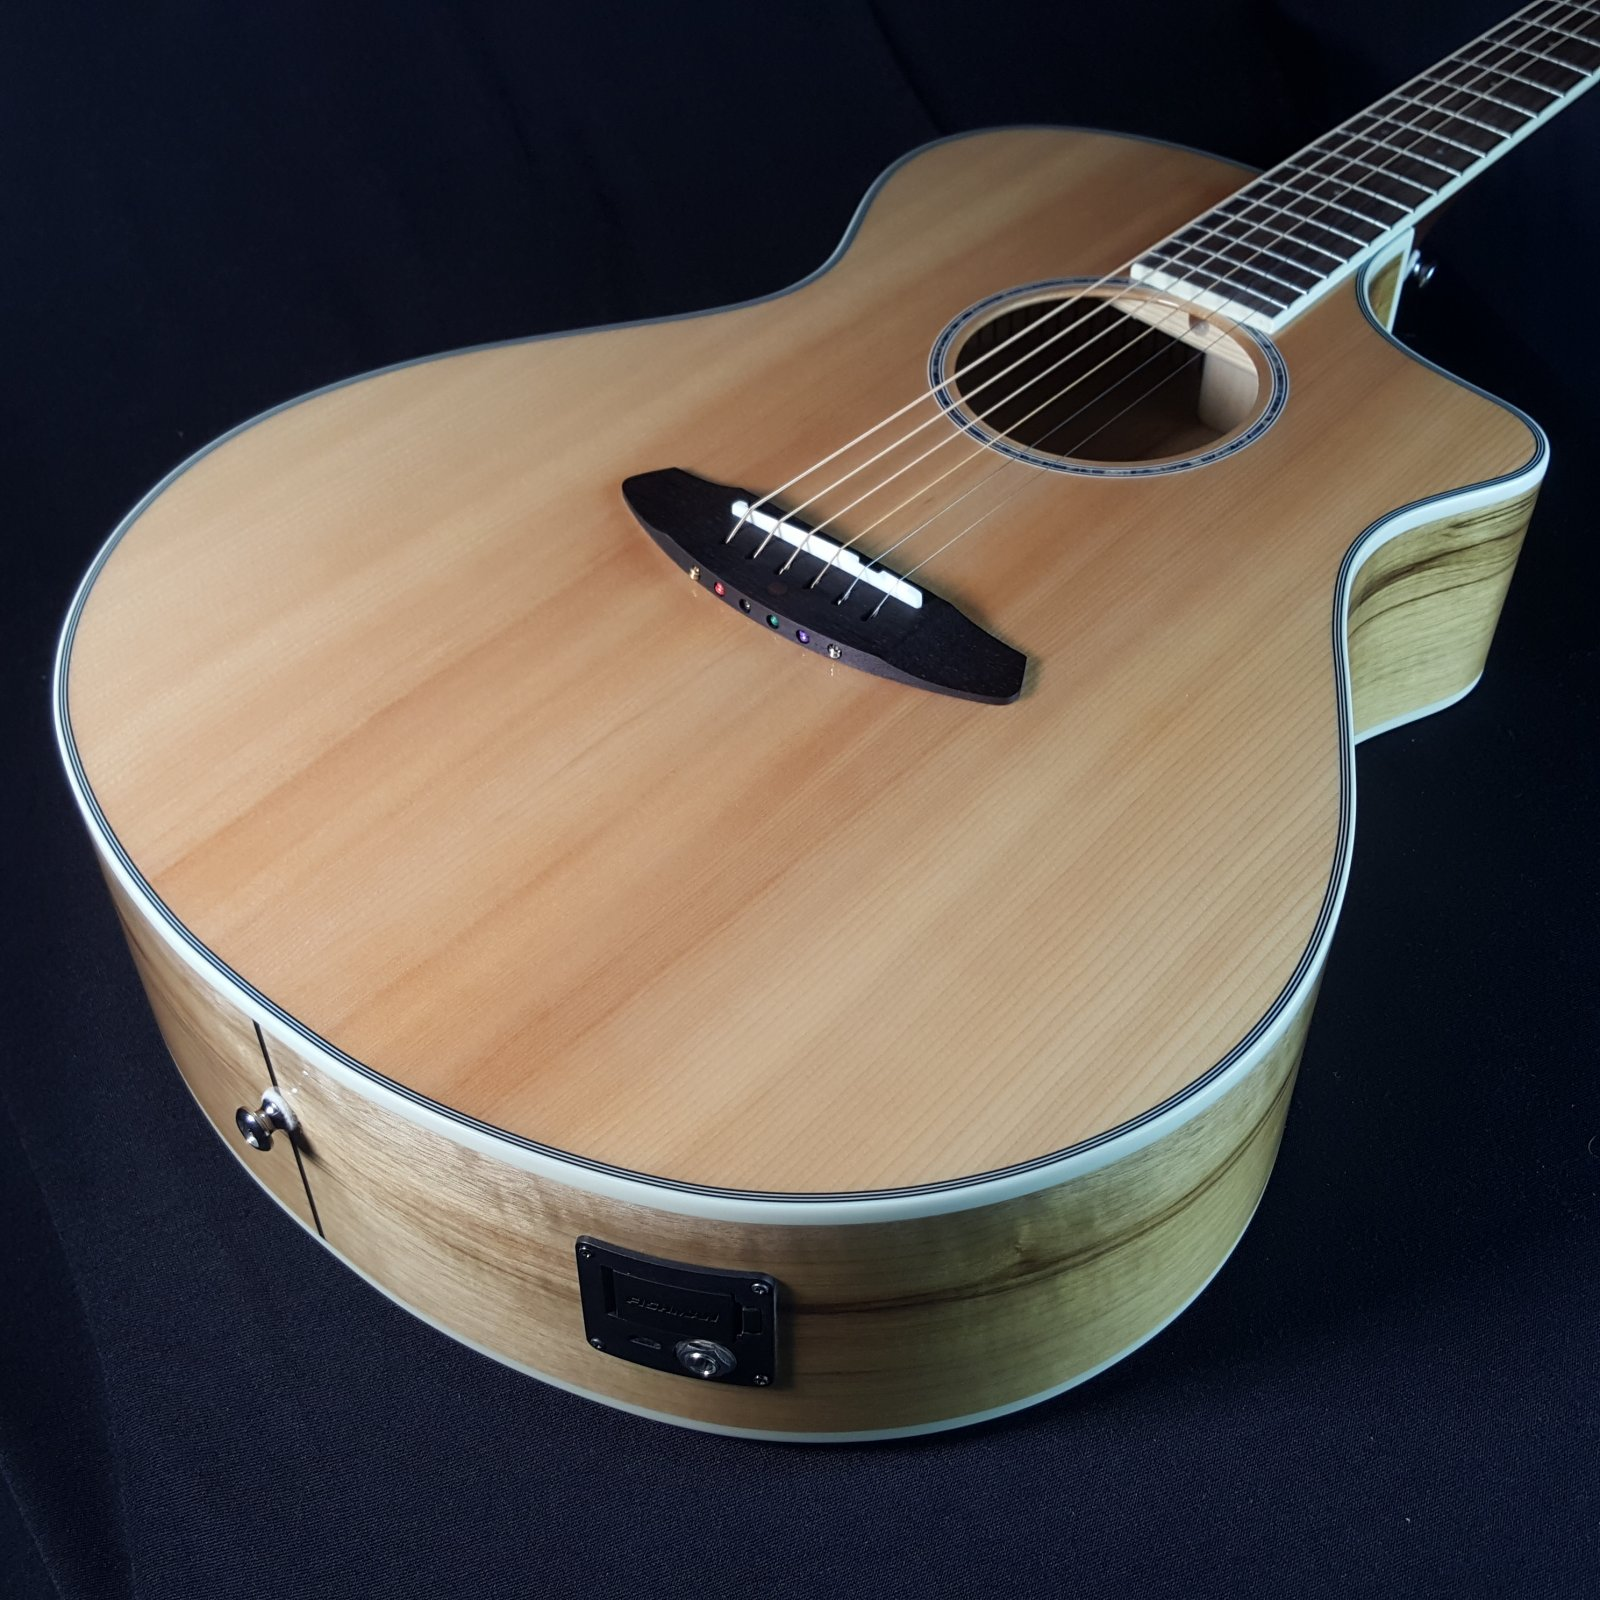 Breedlove Pursuit Exotic Concert CE Myrtlewood Acoustic Guitar with Bag